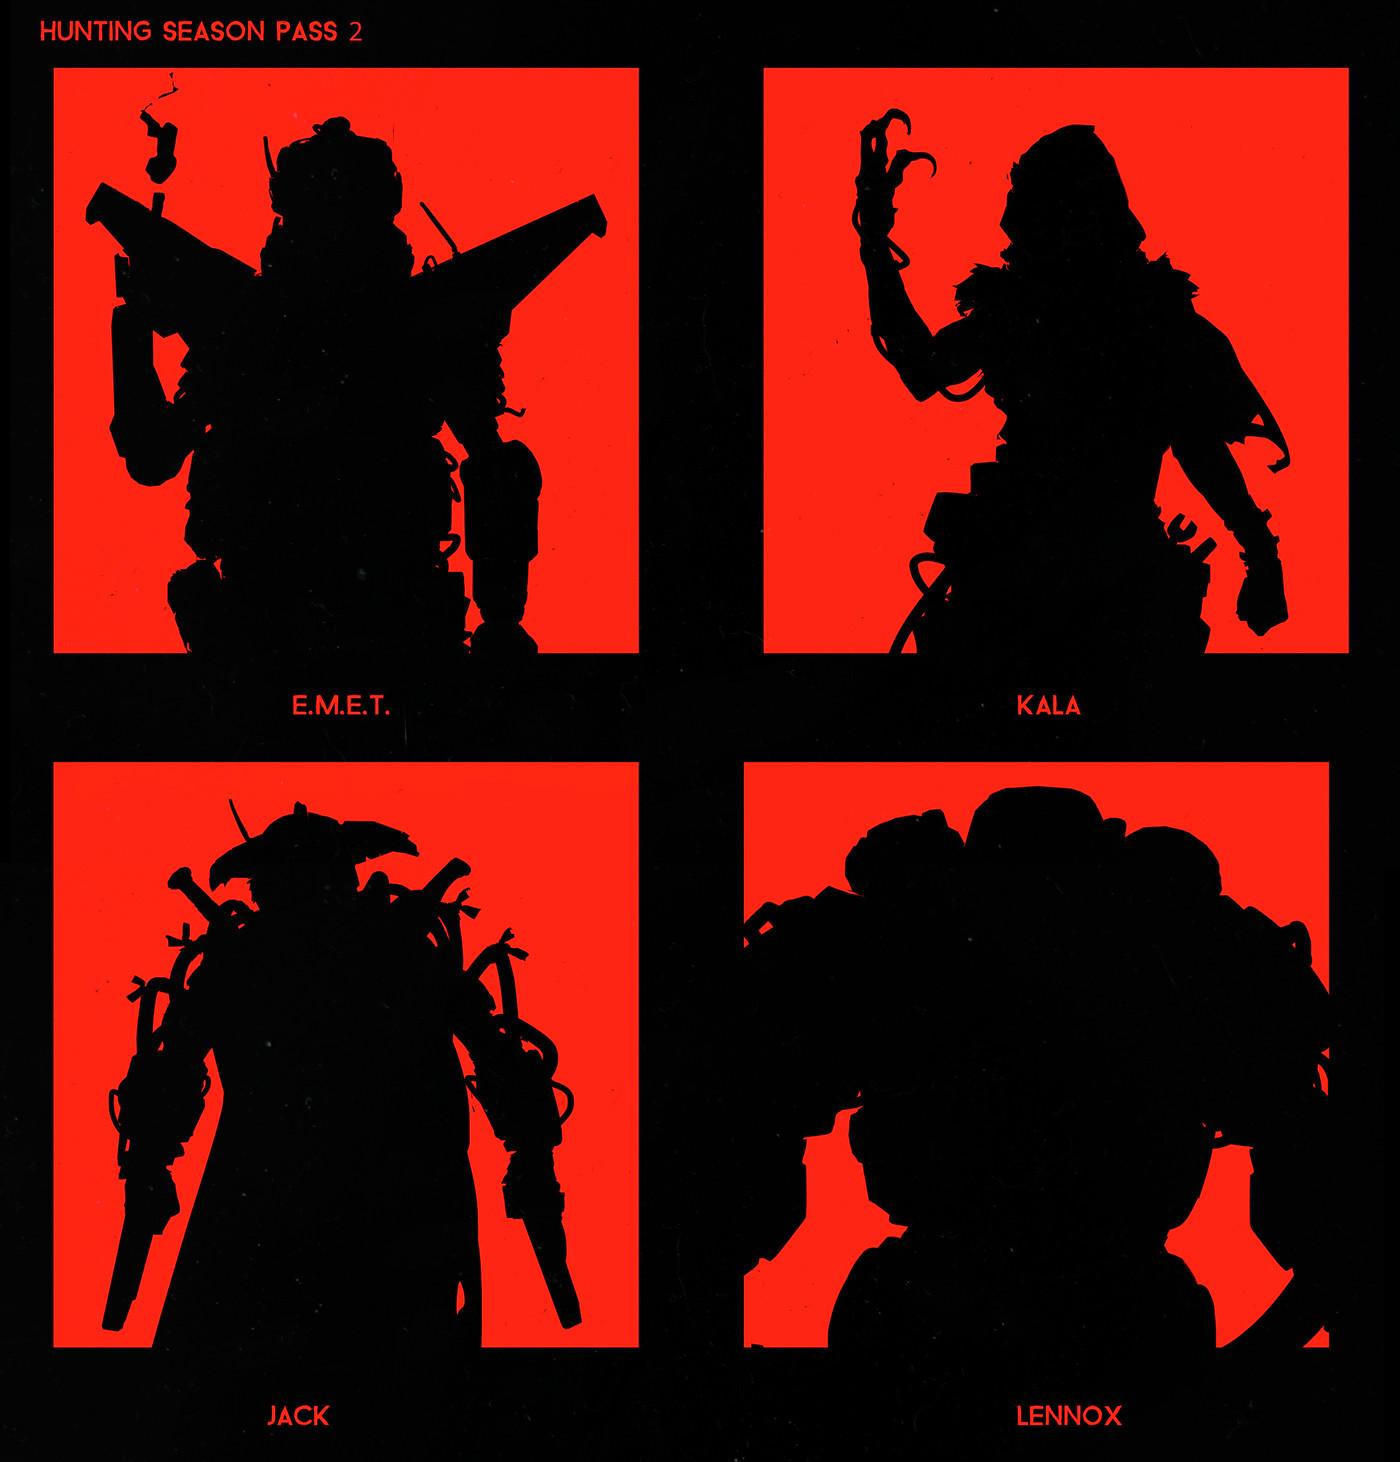 Scott flanders dlc teaser silhouettes hunters